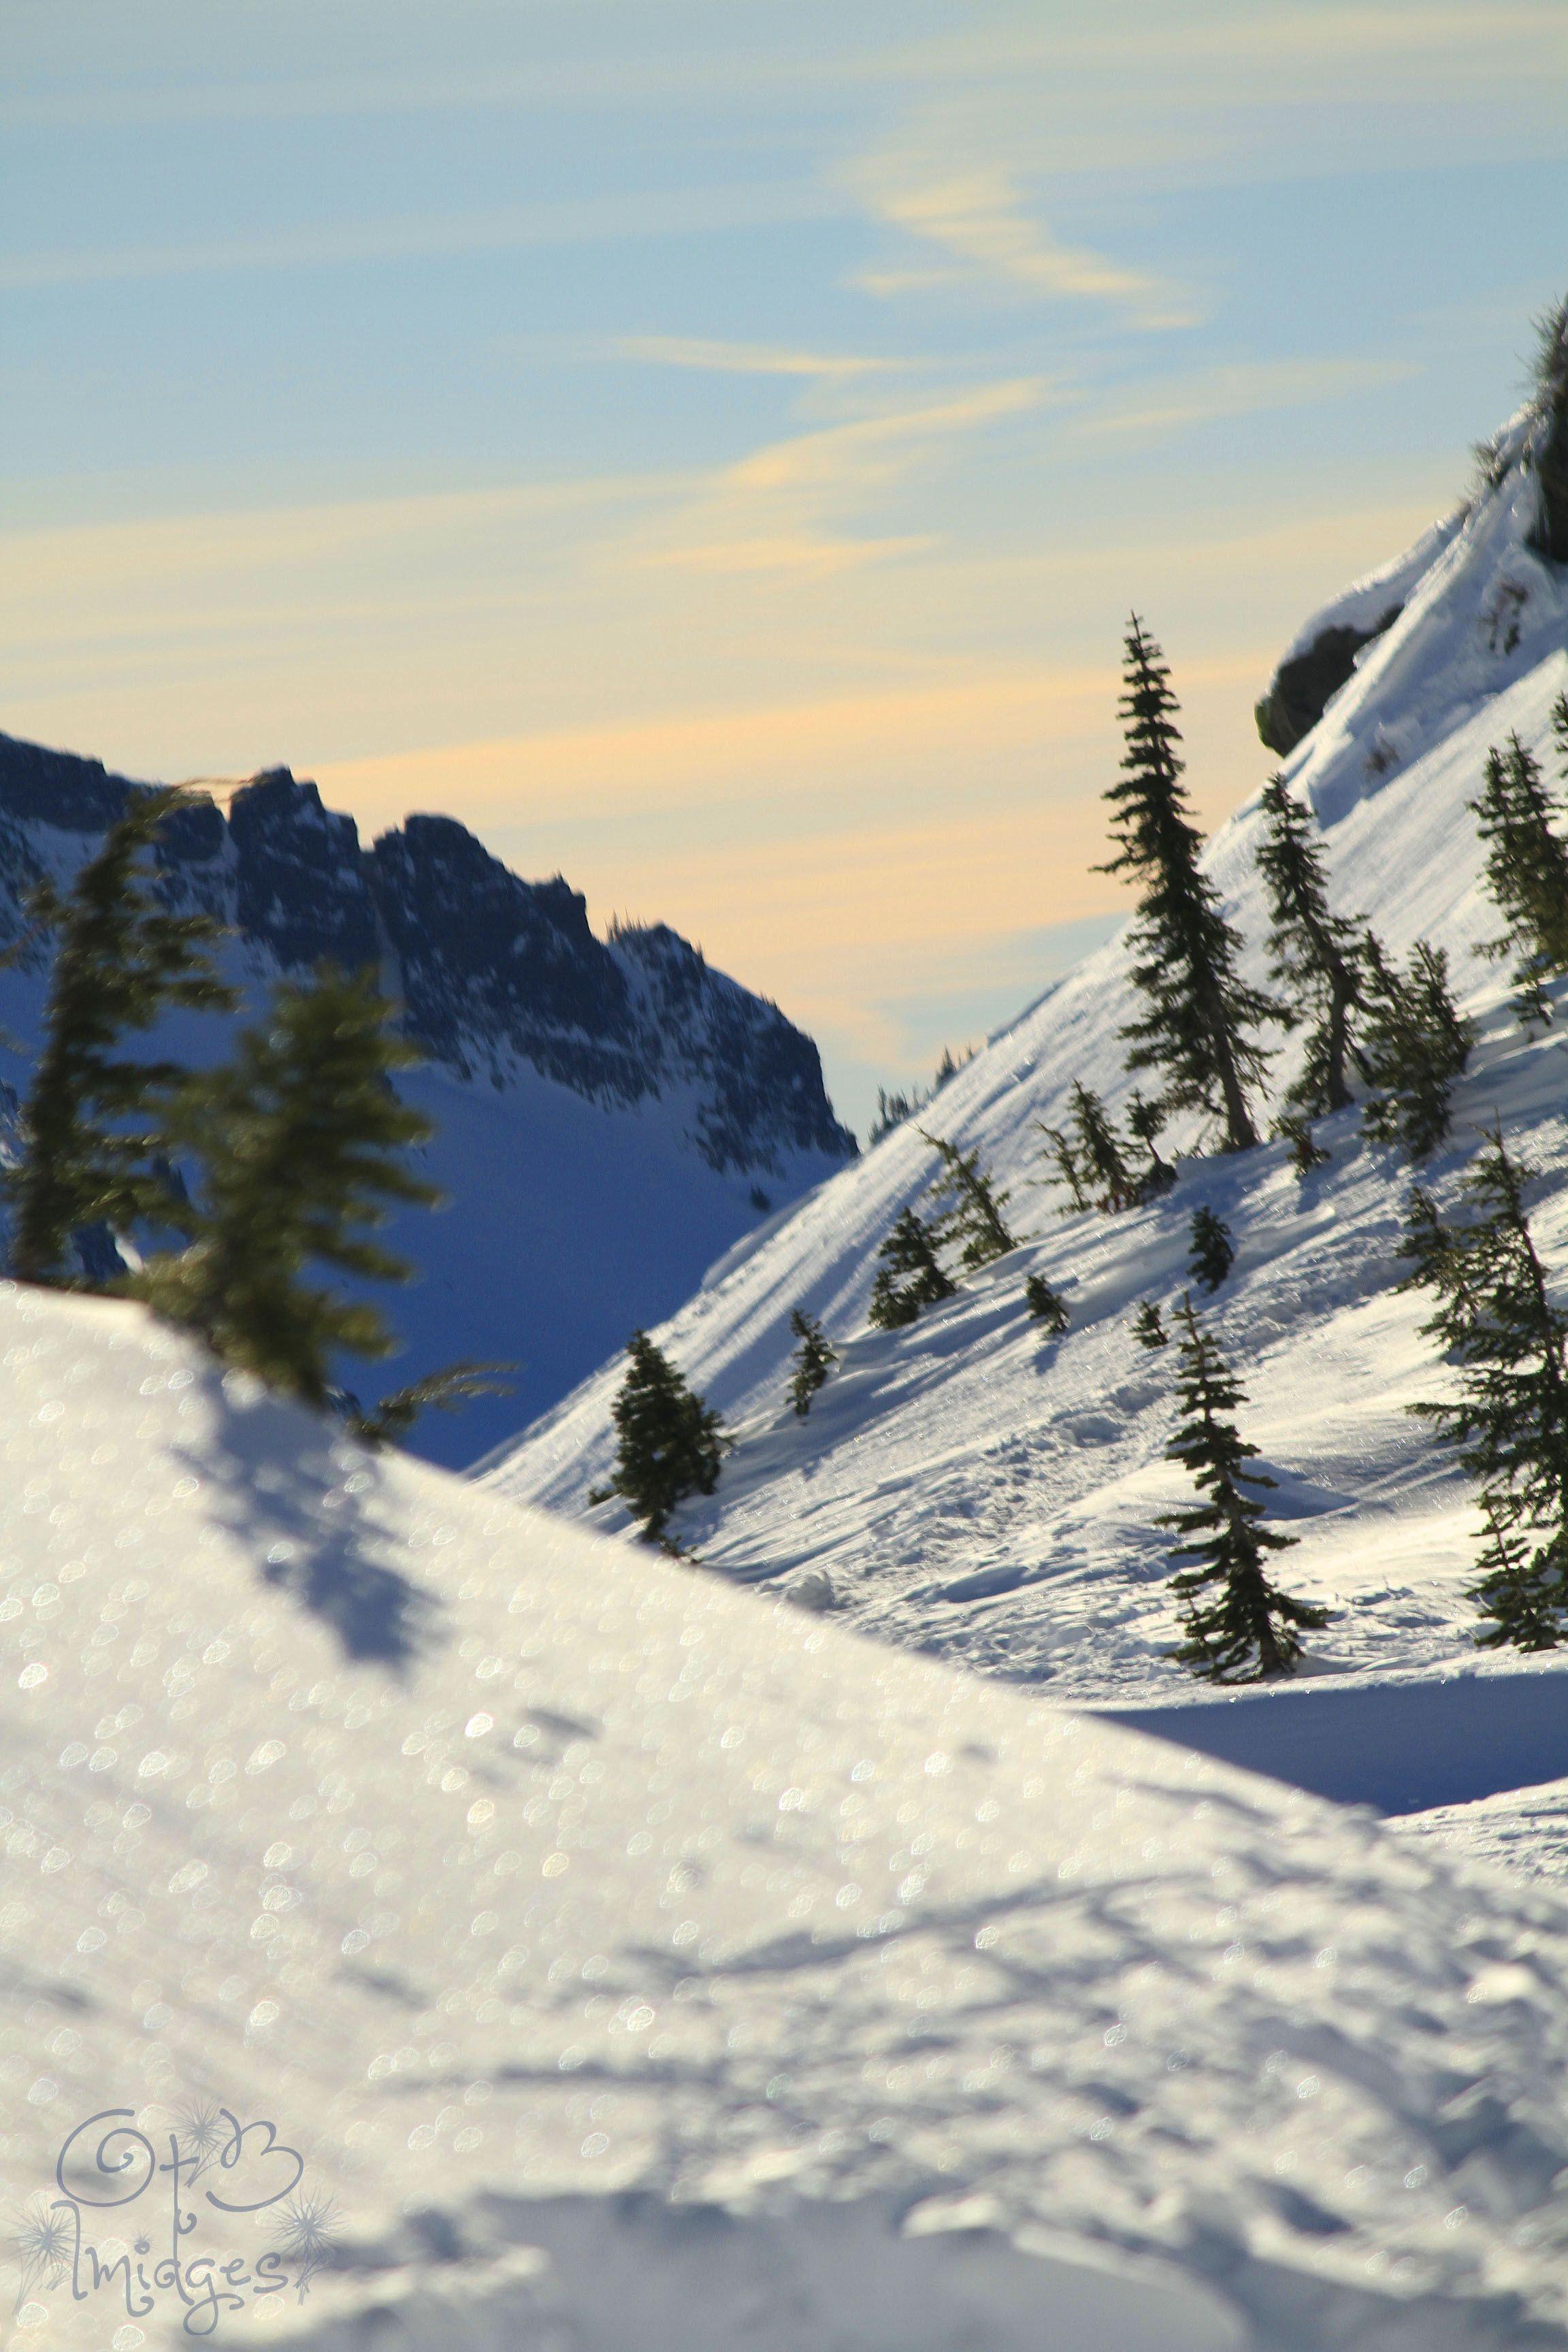 Snow shoeing up at Mt. Rainier,